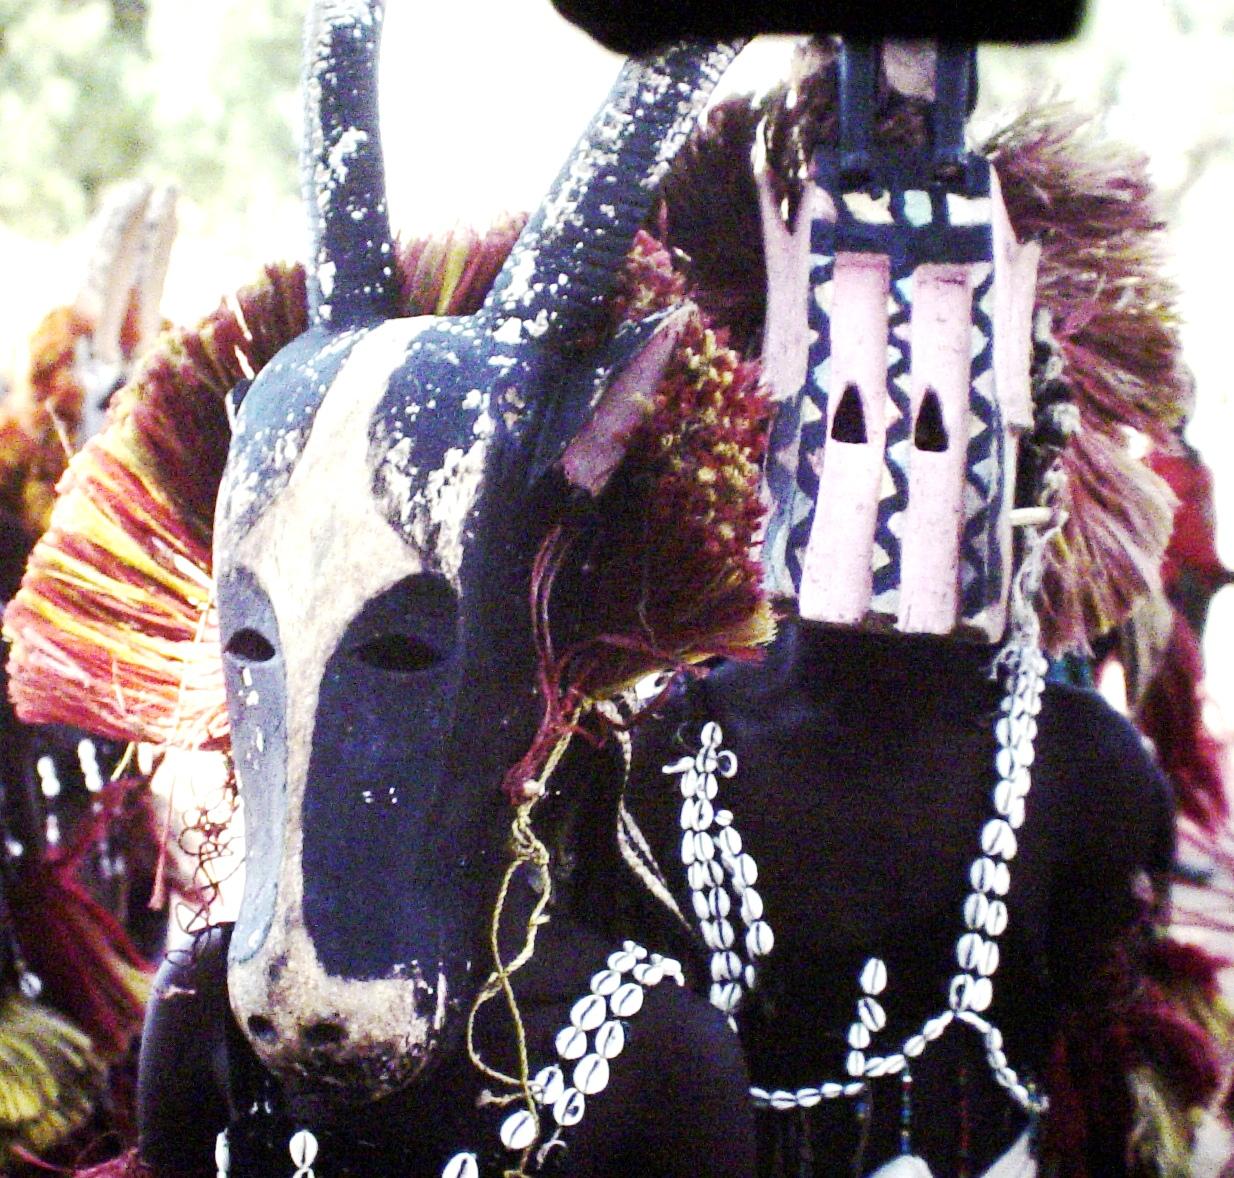 Masque-danse du Pays Dogon (1987) au Mali. Photo: Alain Cloarec